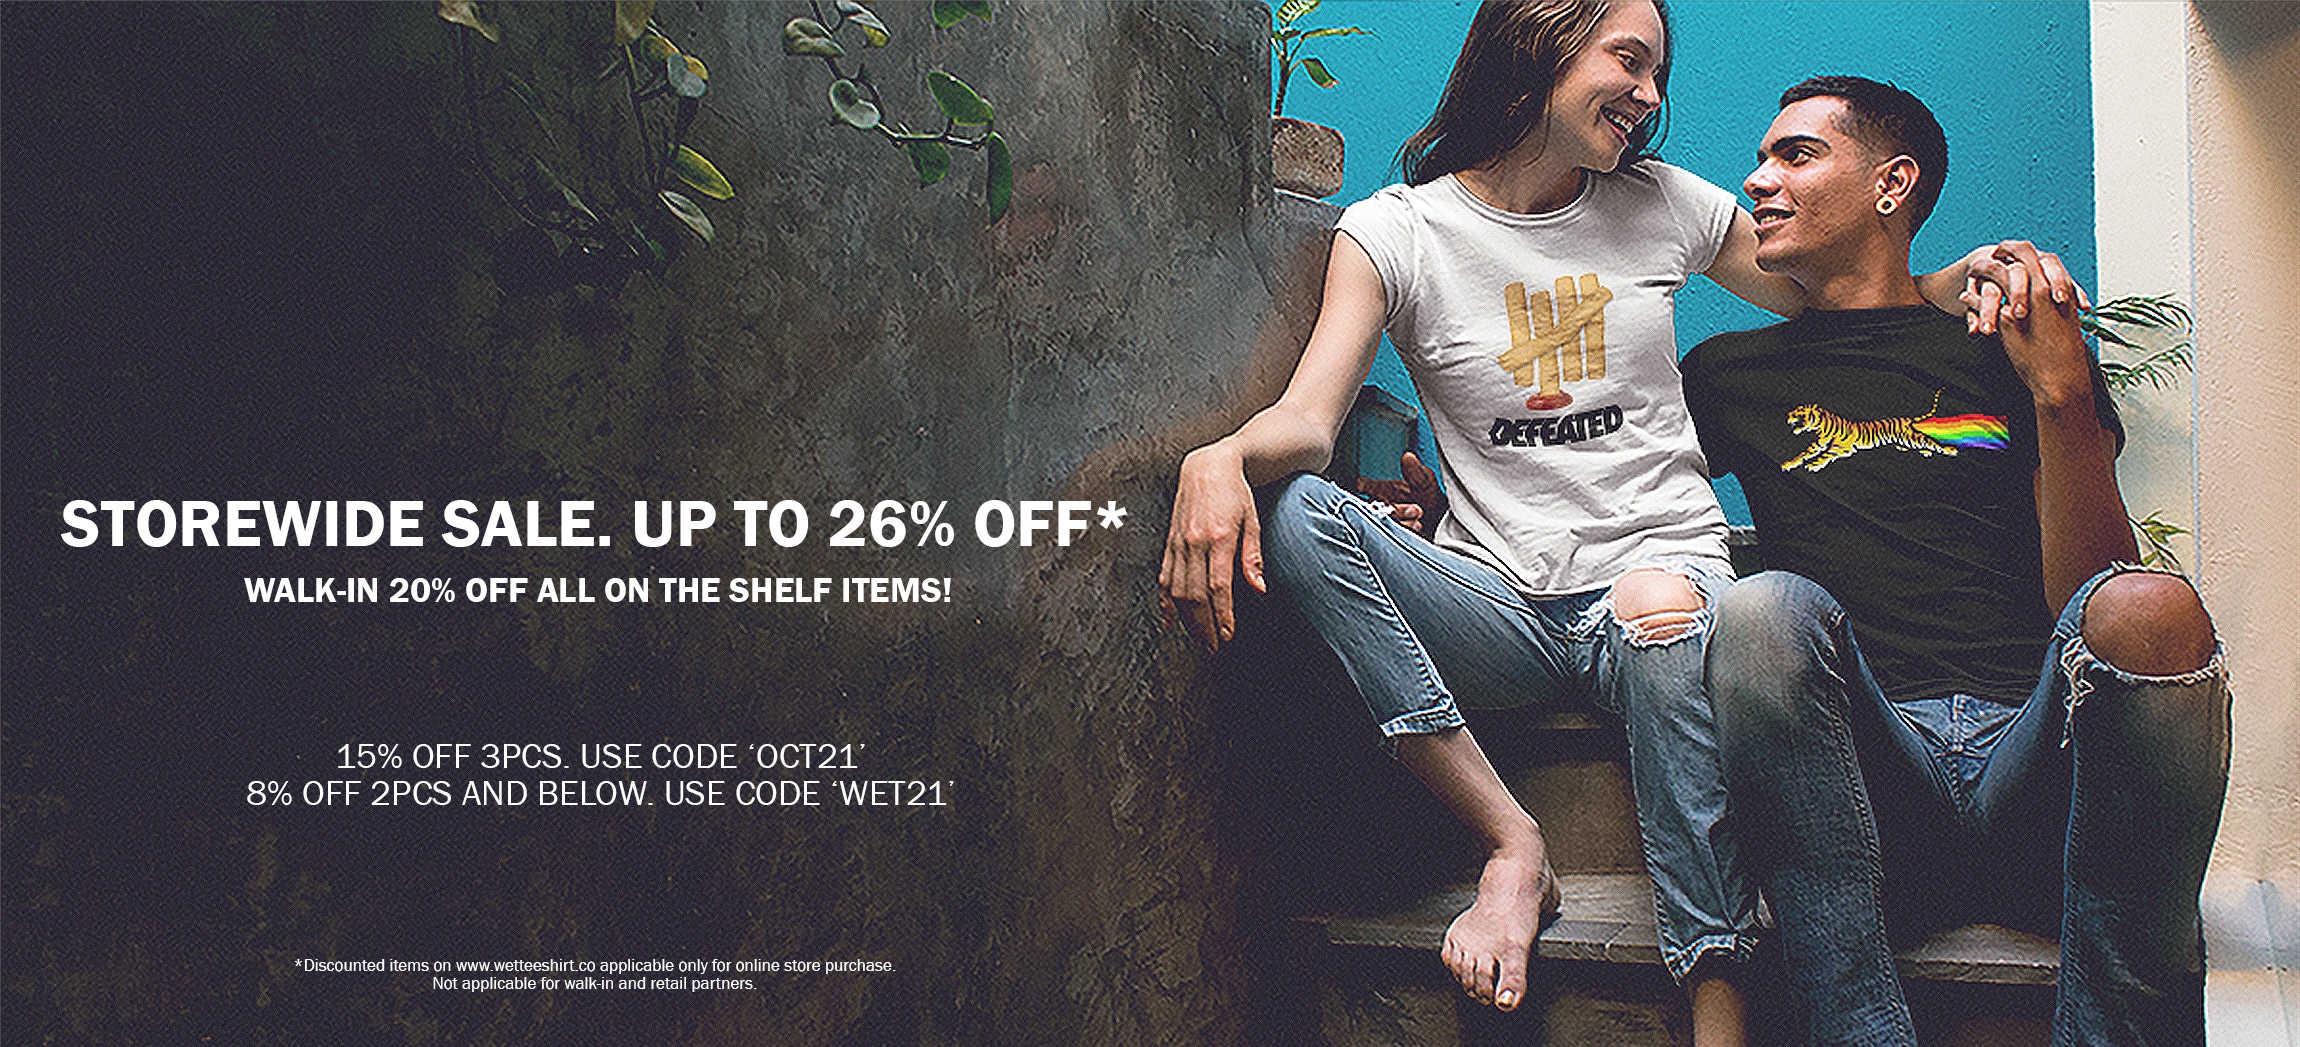 26-off-walk-in-sale-for-tshirt-on-the-shelf-fb